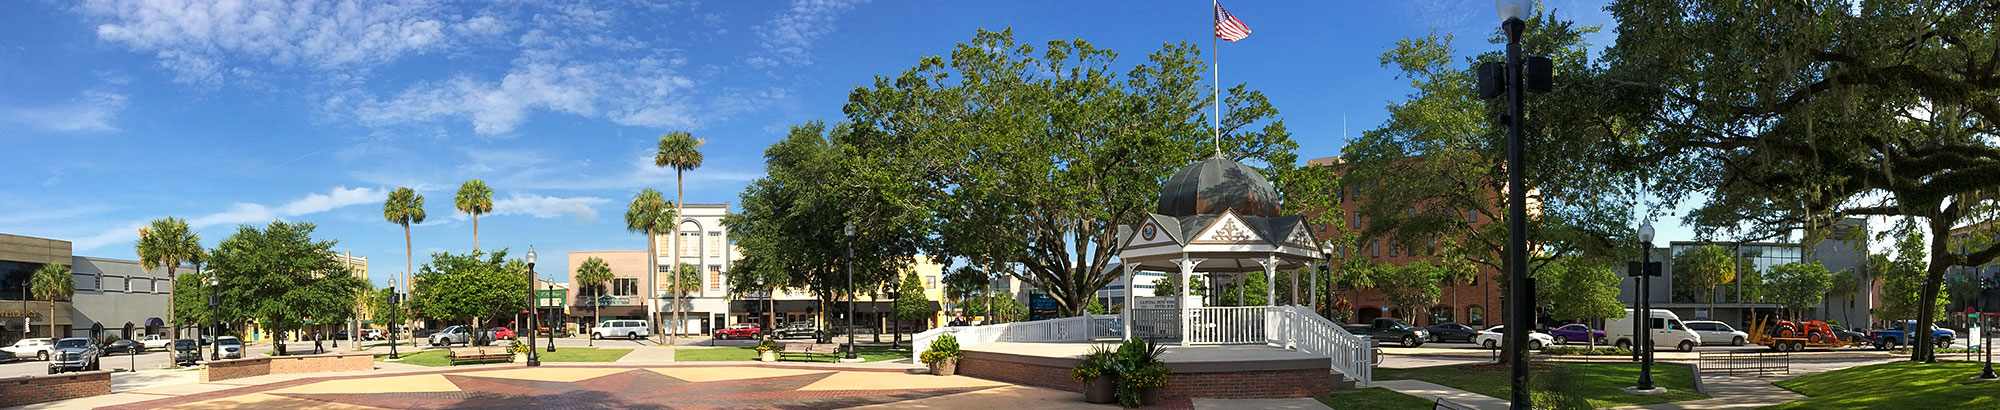 Ocala, Florida Downtown - Web Design